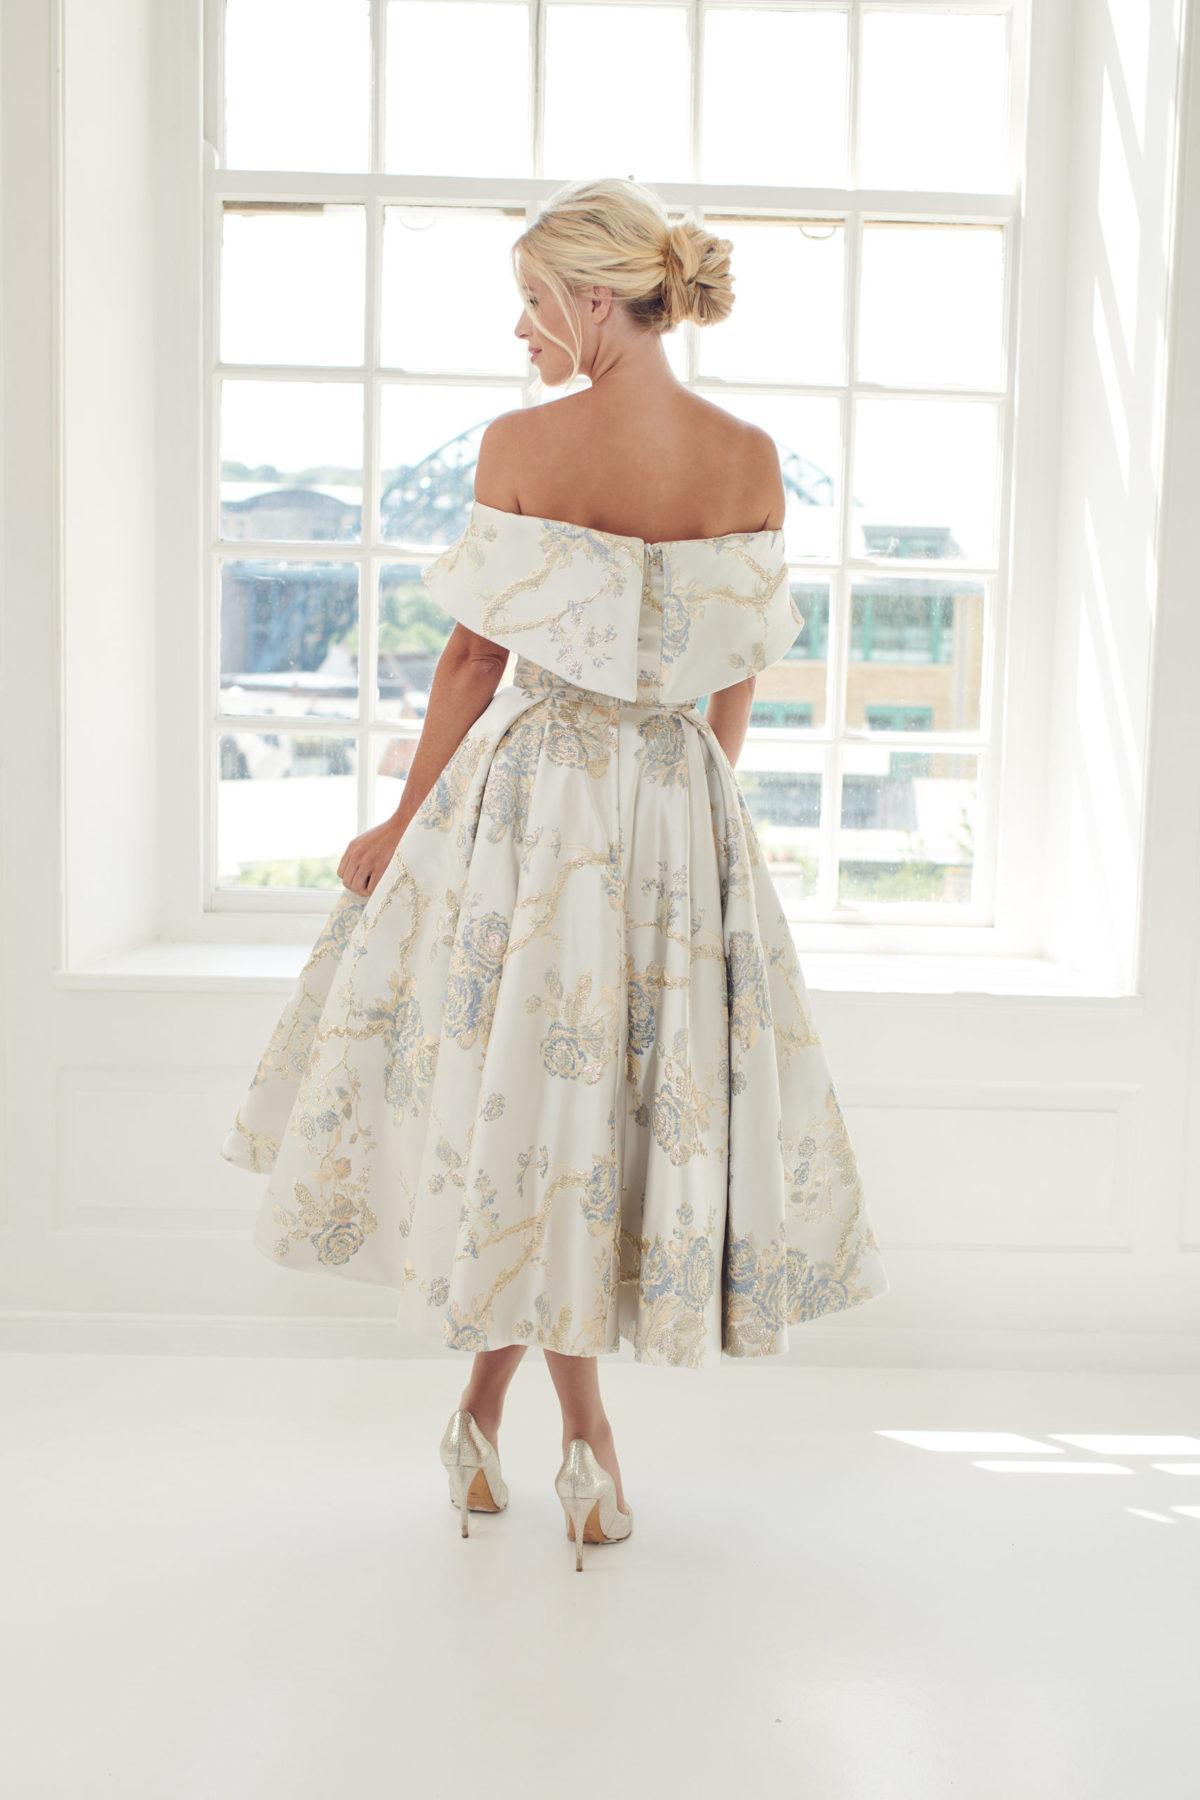 grey floral wedding gown